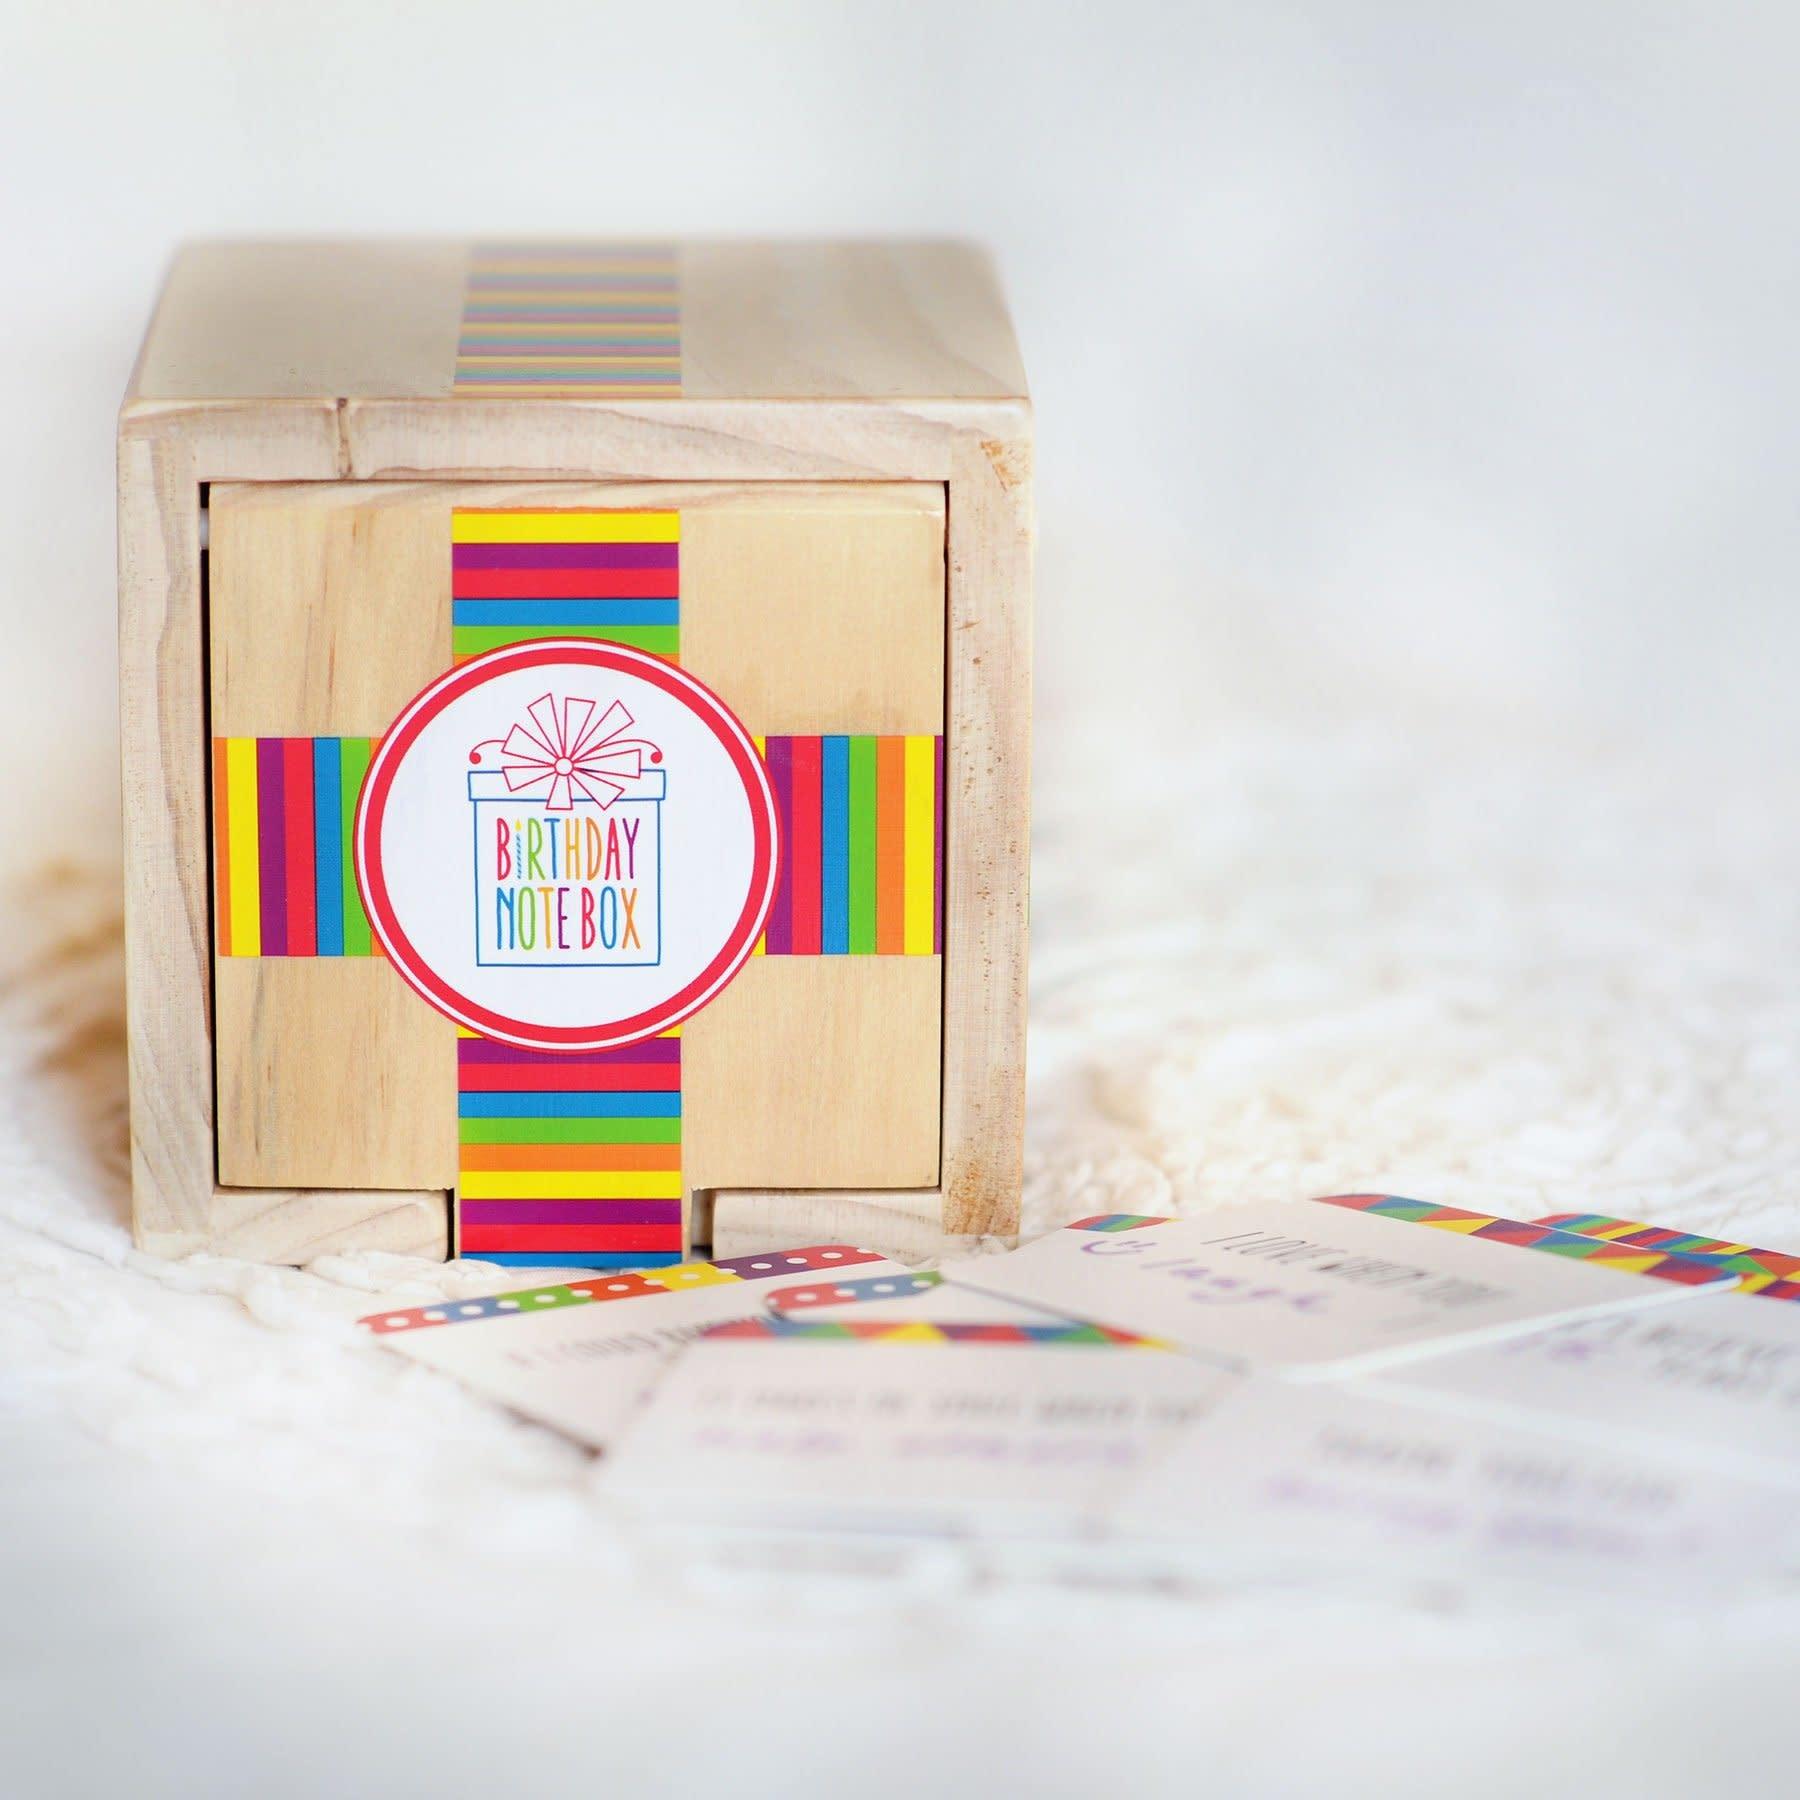 Star Kids Company Birthday Note Box